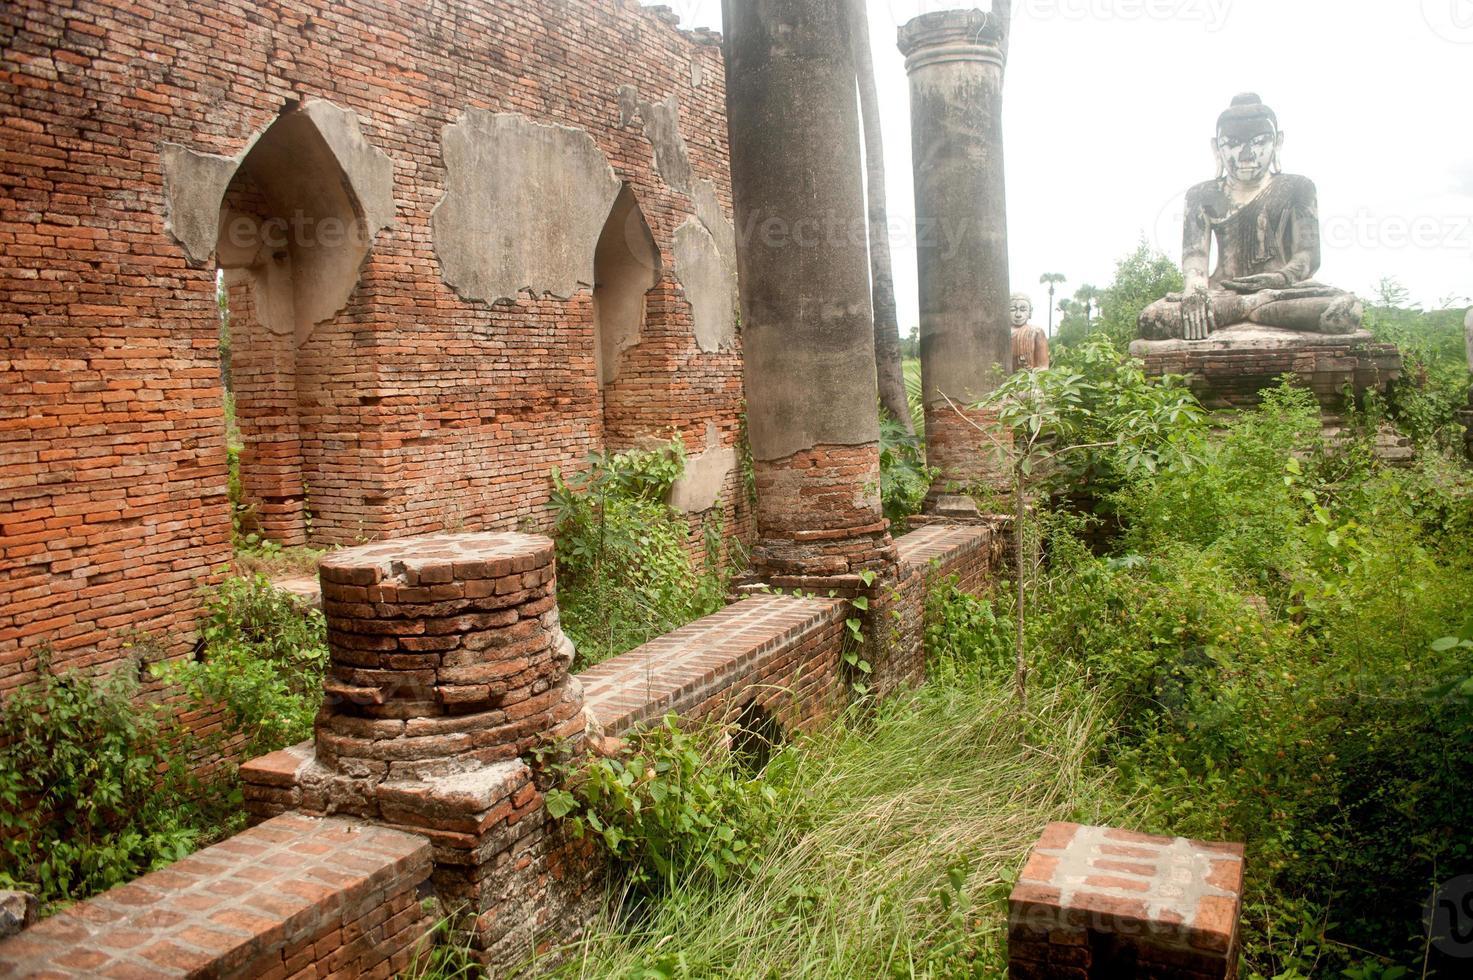 Yadana hsemee pagoda complex en myanmar. foto